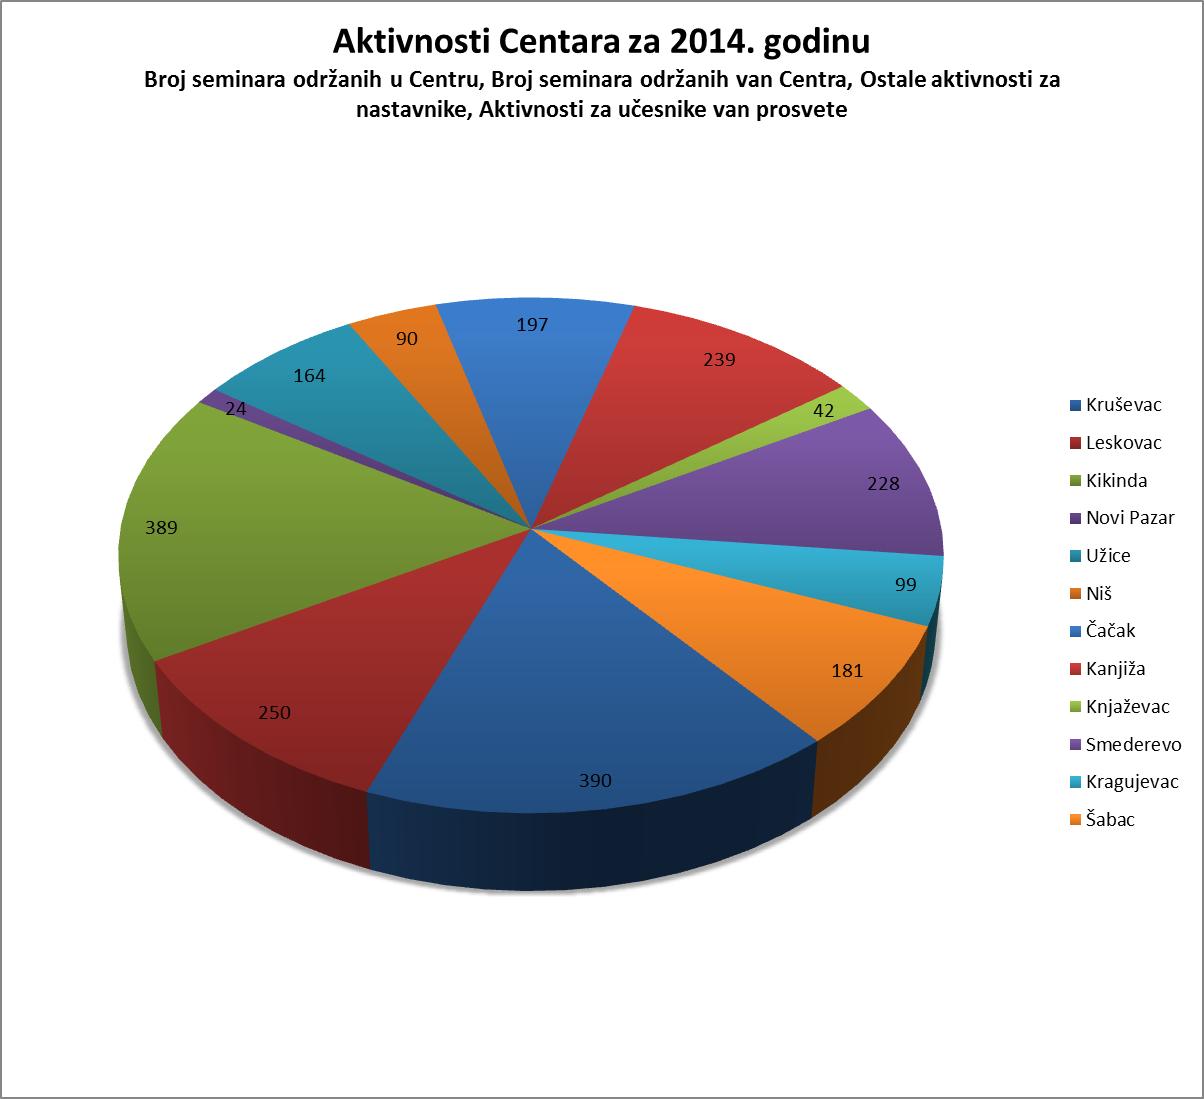 aktivnosti centra za 2014 (2)